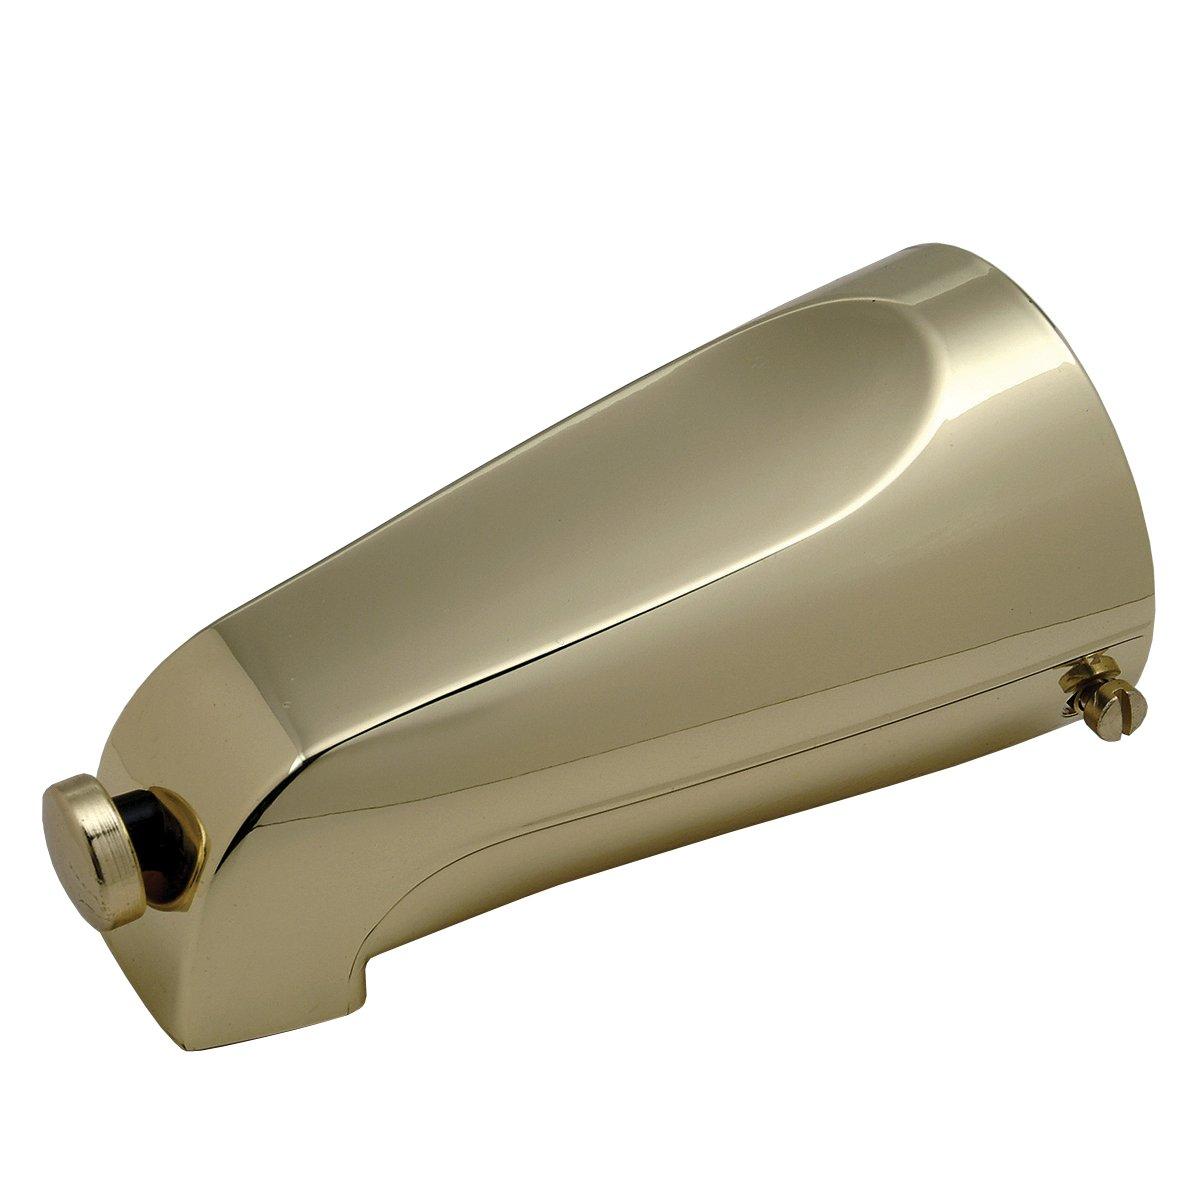 71PB BrassCraft Mfg SWD0429 MIXET DIVRTR TUB SPOUT-QUIKSPOUT-PB